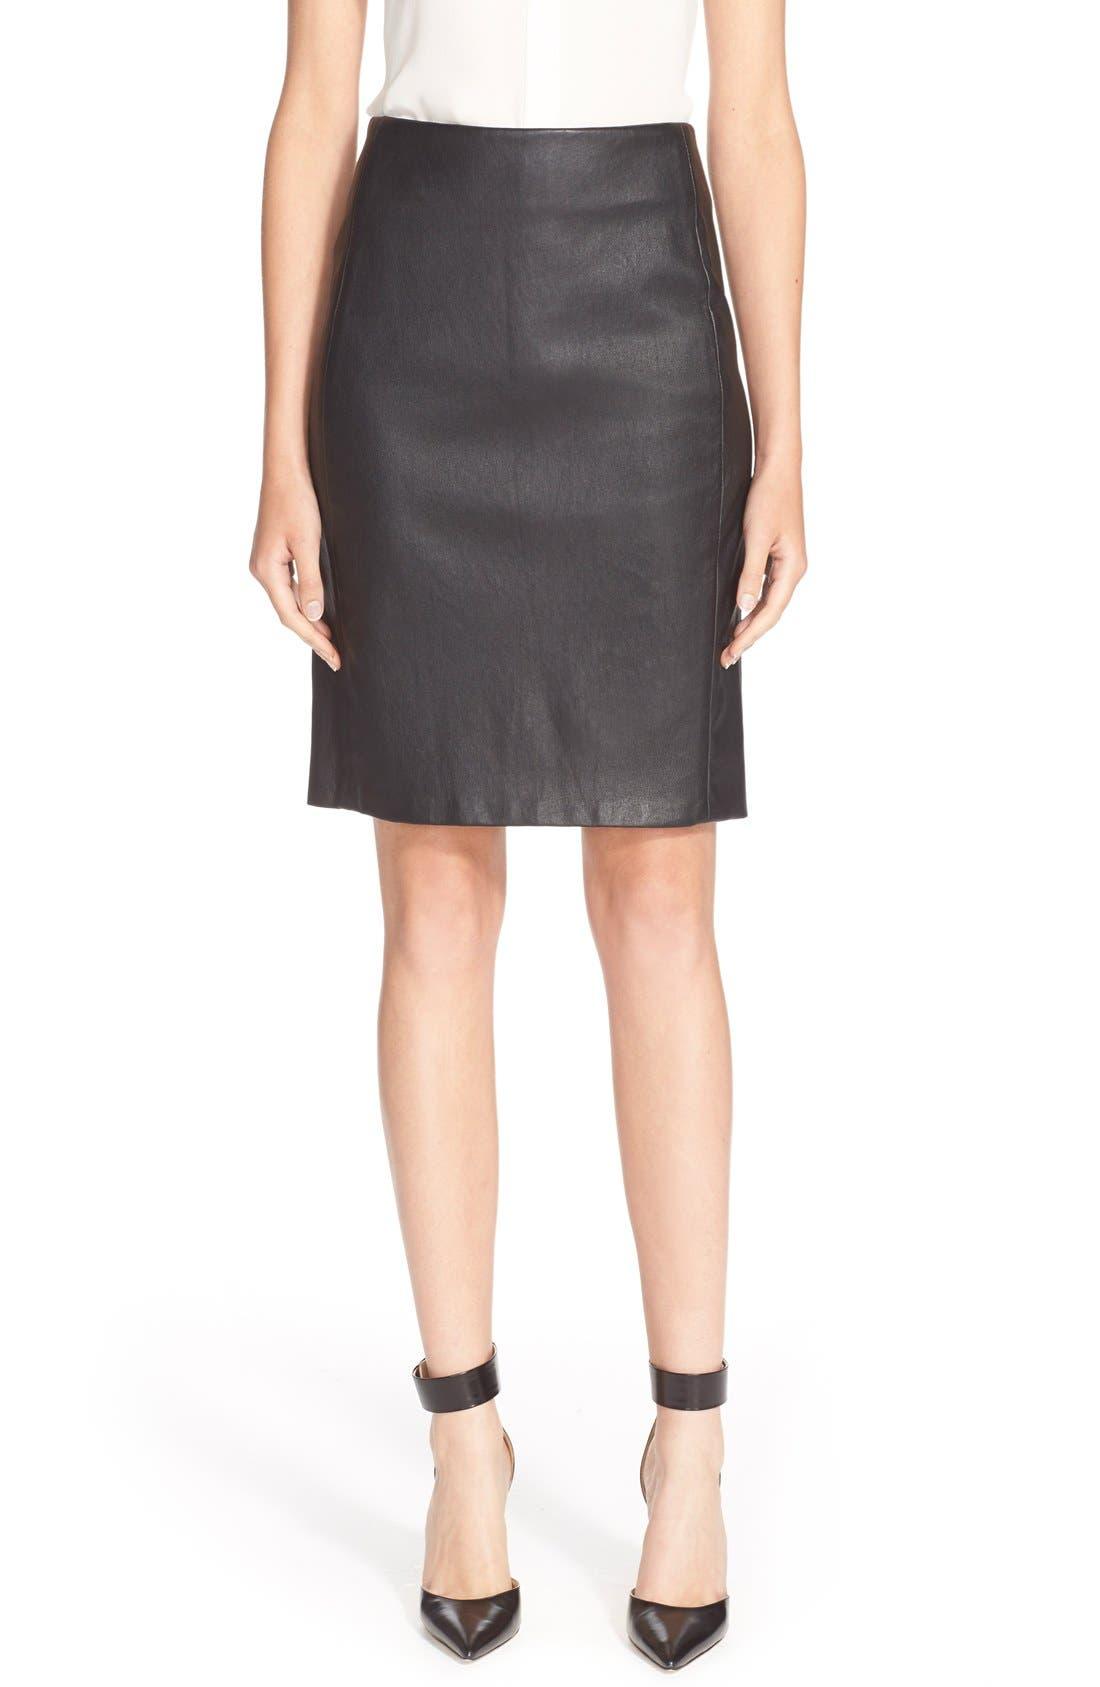 Alternate Image 1 Selected - Diane vonFurstenberg'Cloe' Leather Pencil Skirt